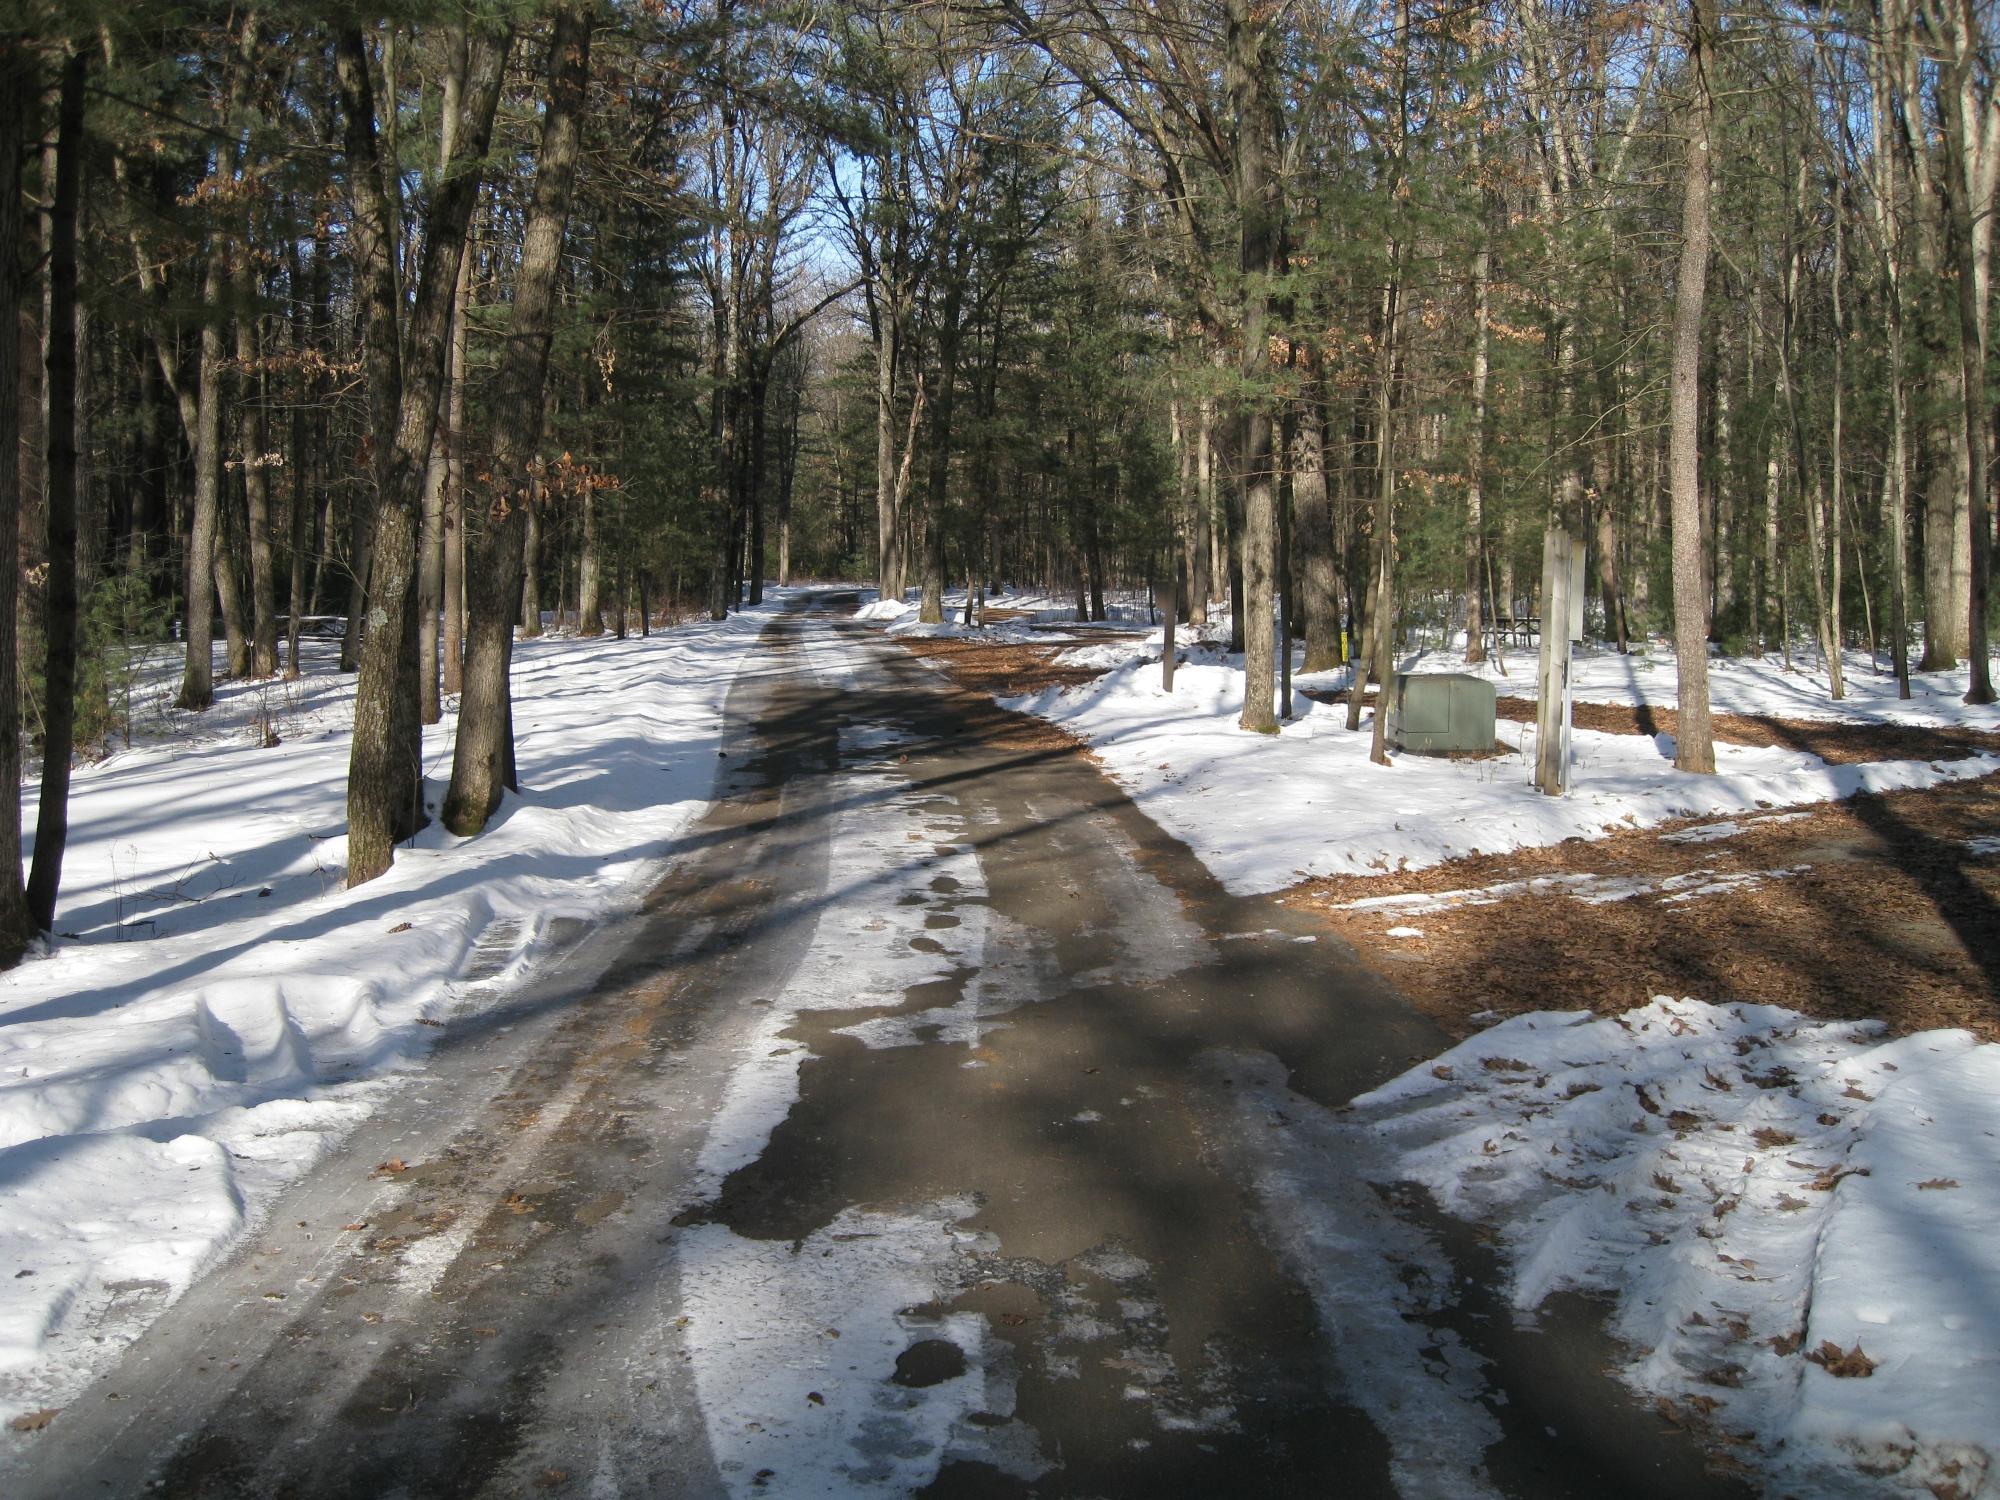 Castle Mound Campground